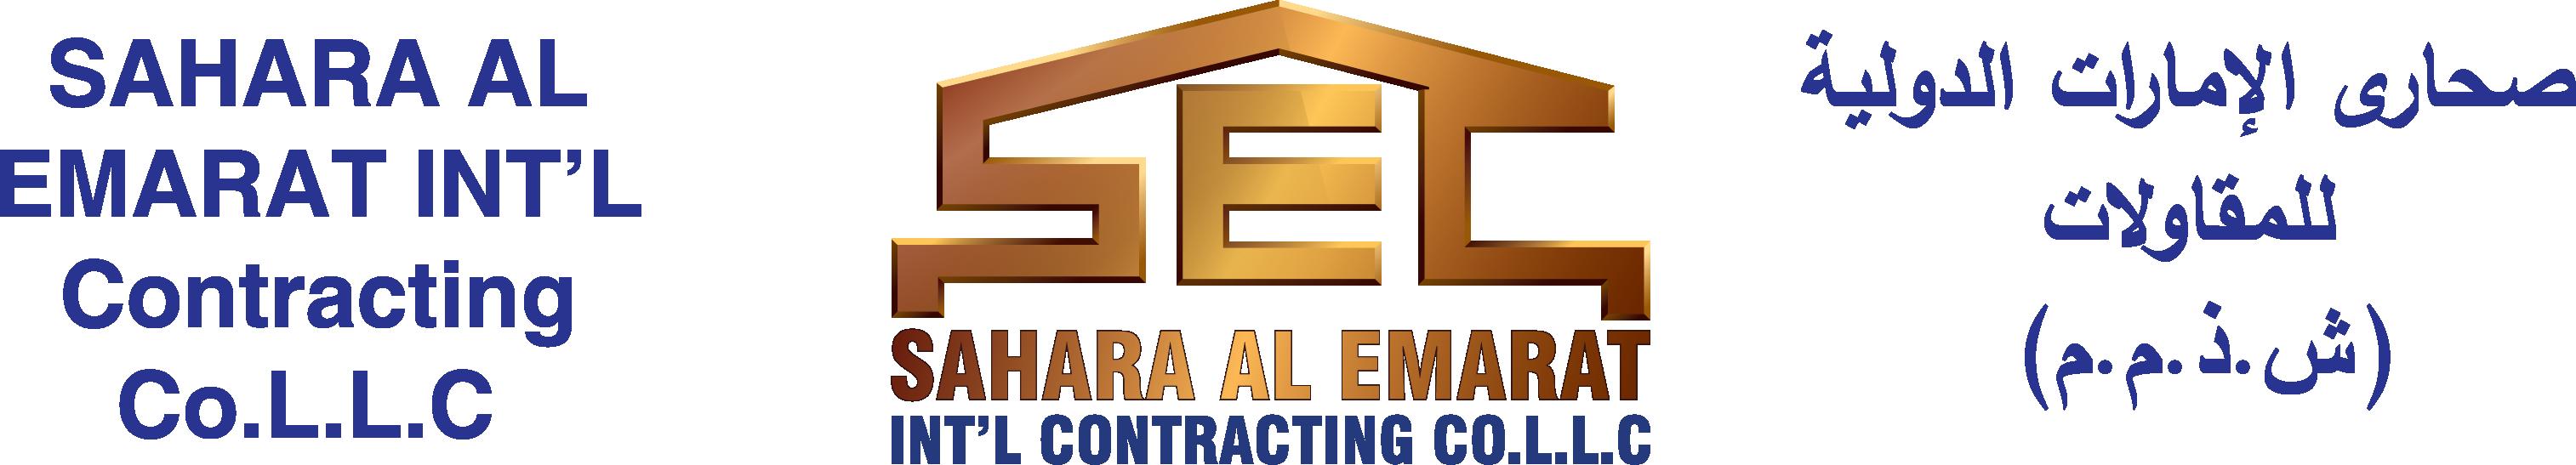 Sahara Al Emarat International Contracting Co.